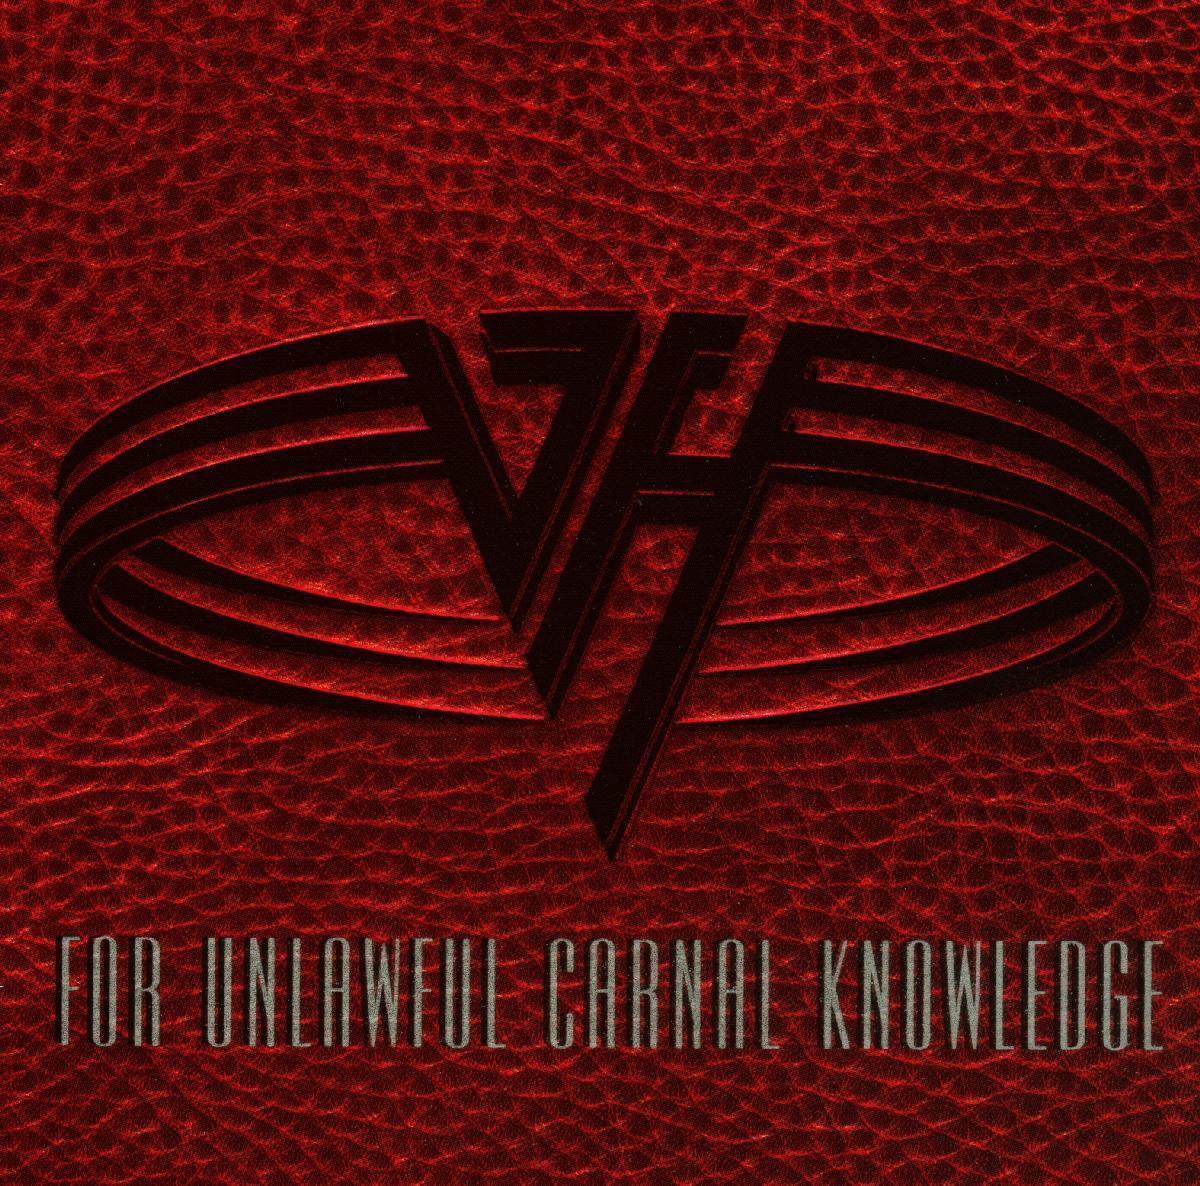 Bol Com For Unlawful Carnal Knowledge Van Halen Cd Album Muziek